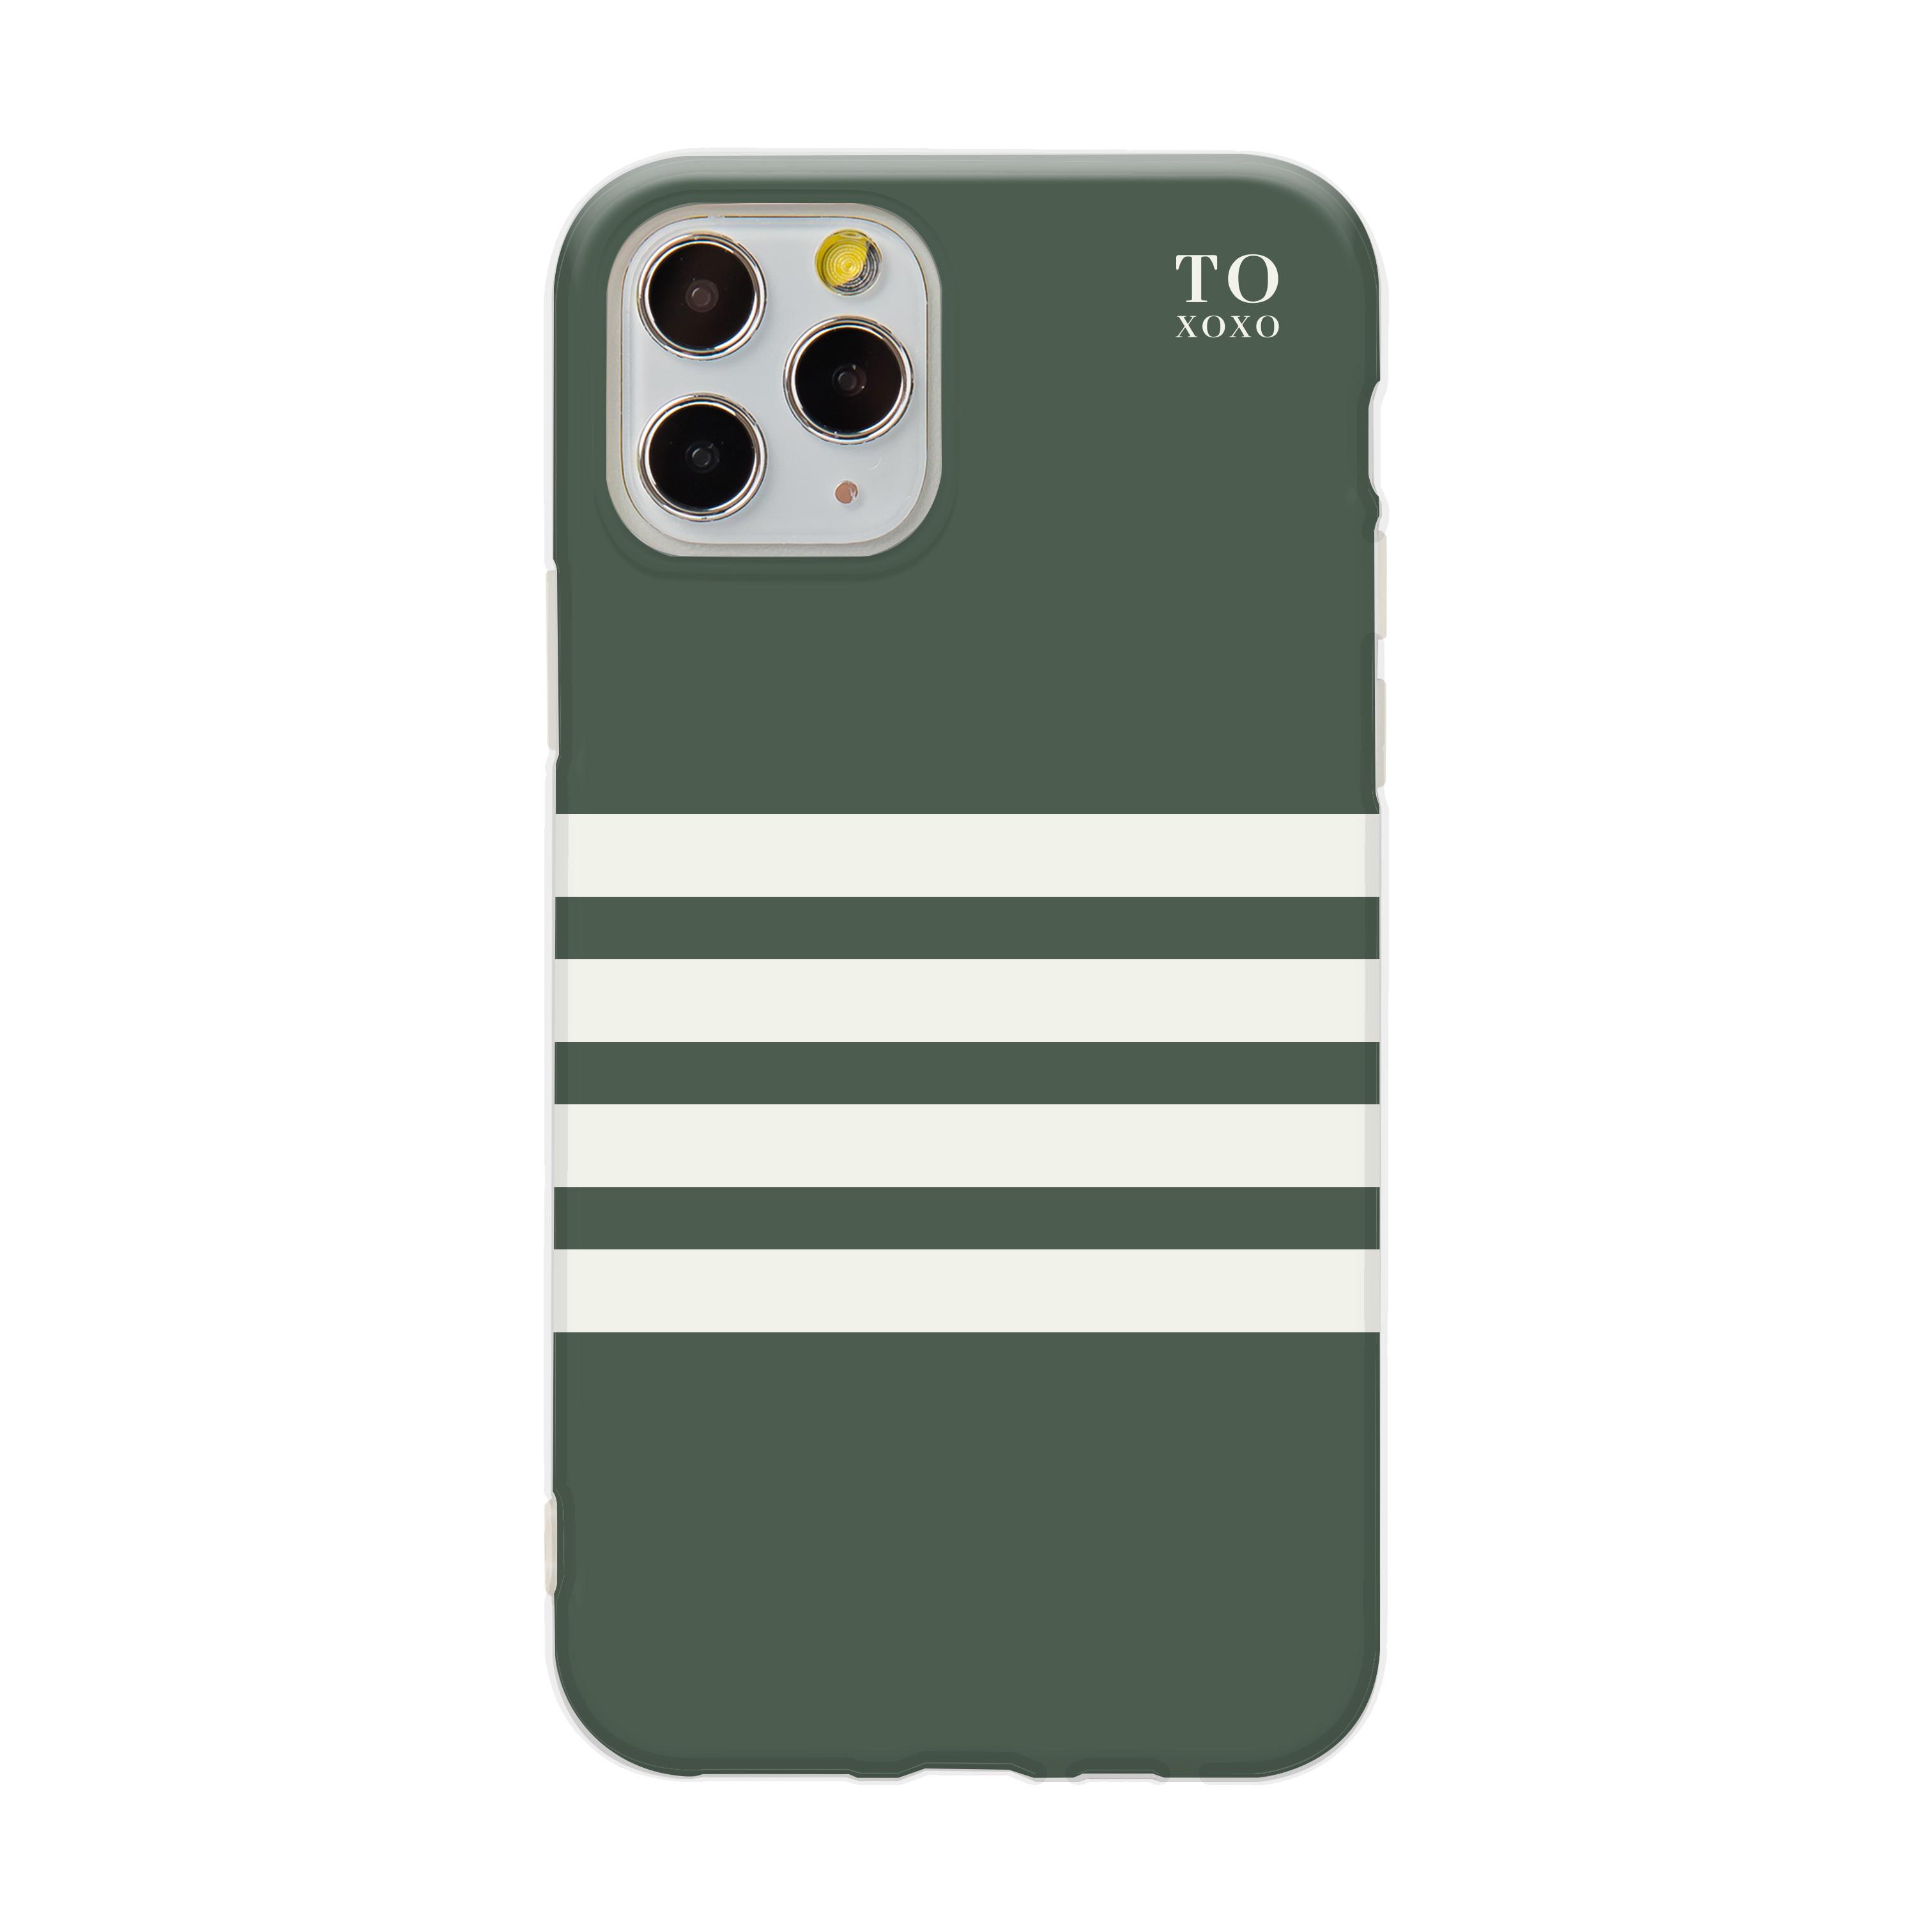 【 TOXOXO 】Ultra Pro系列 ❘ 綠白條紋iPhone防摔手機殼